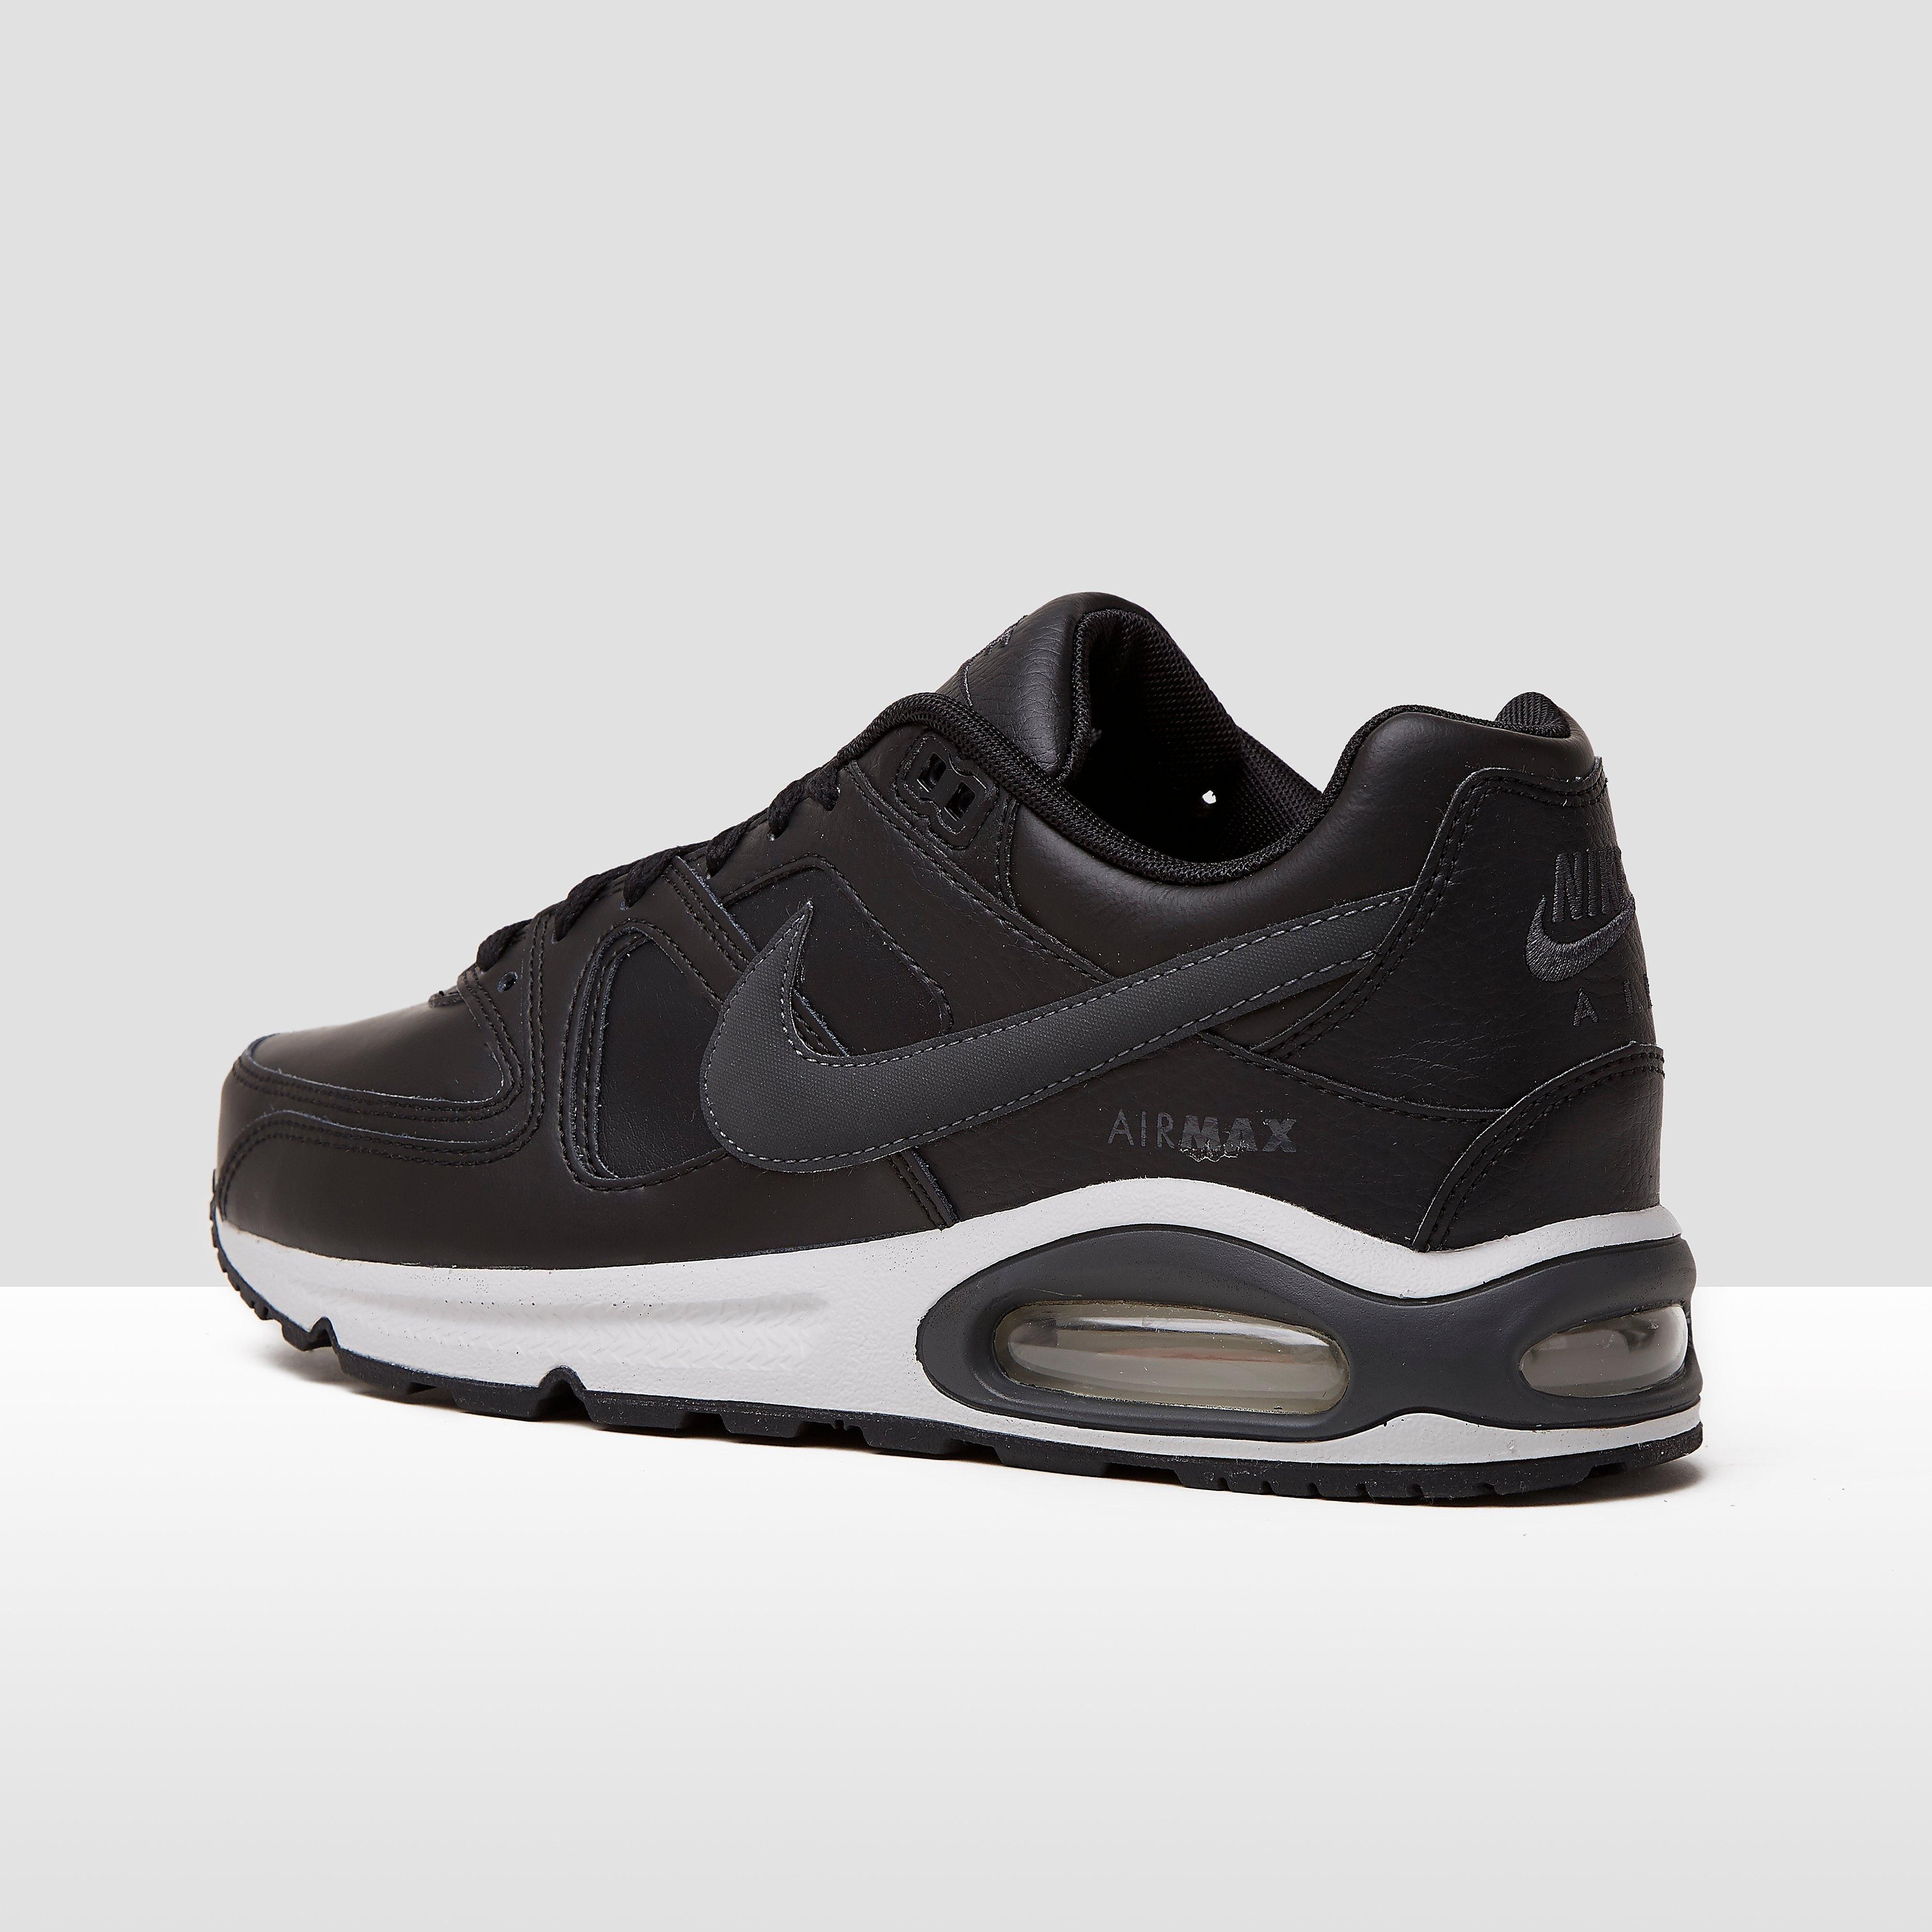 Air max command leather sneakers zwart heren